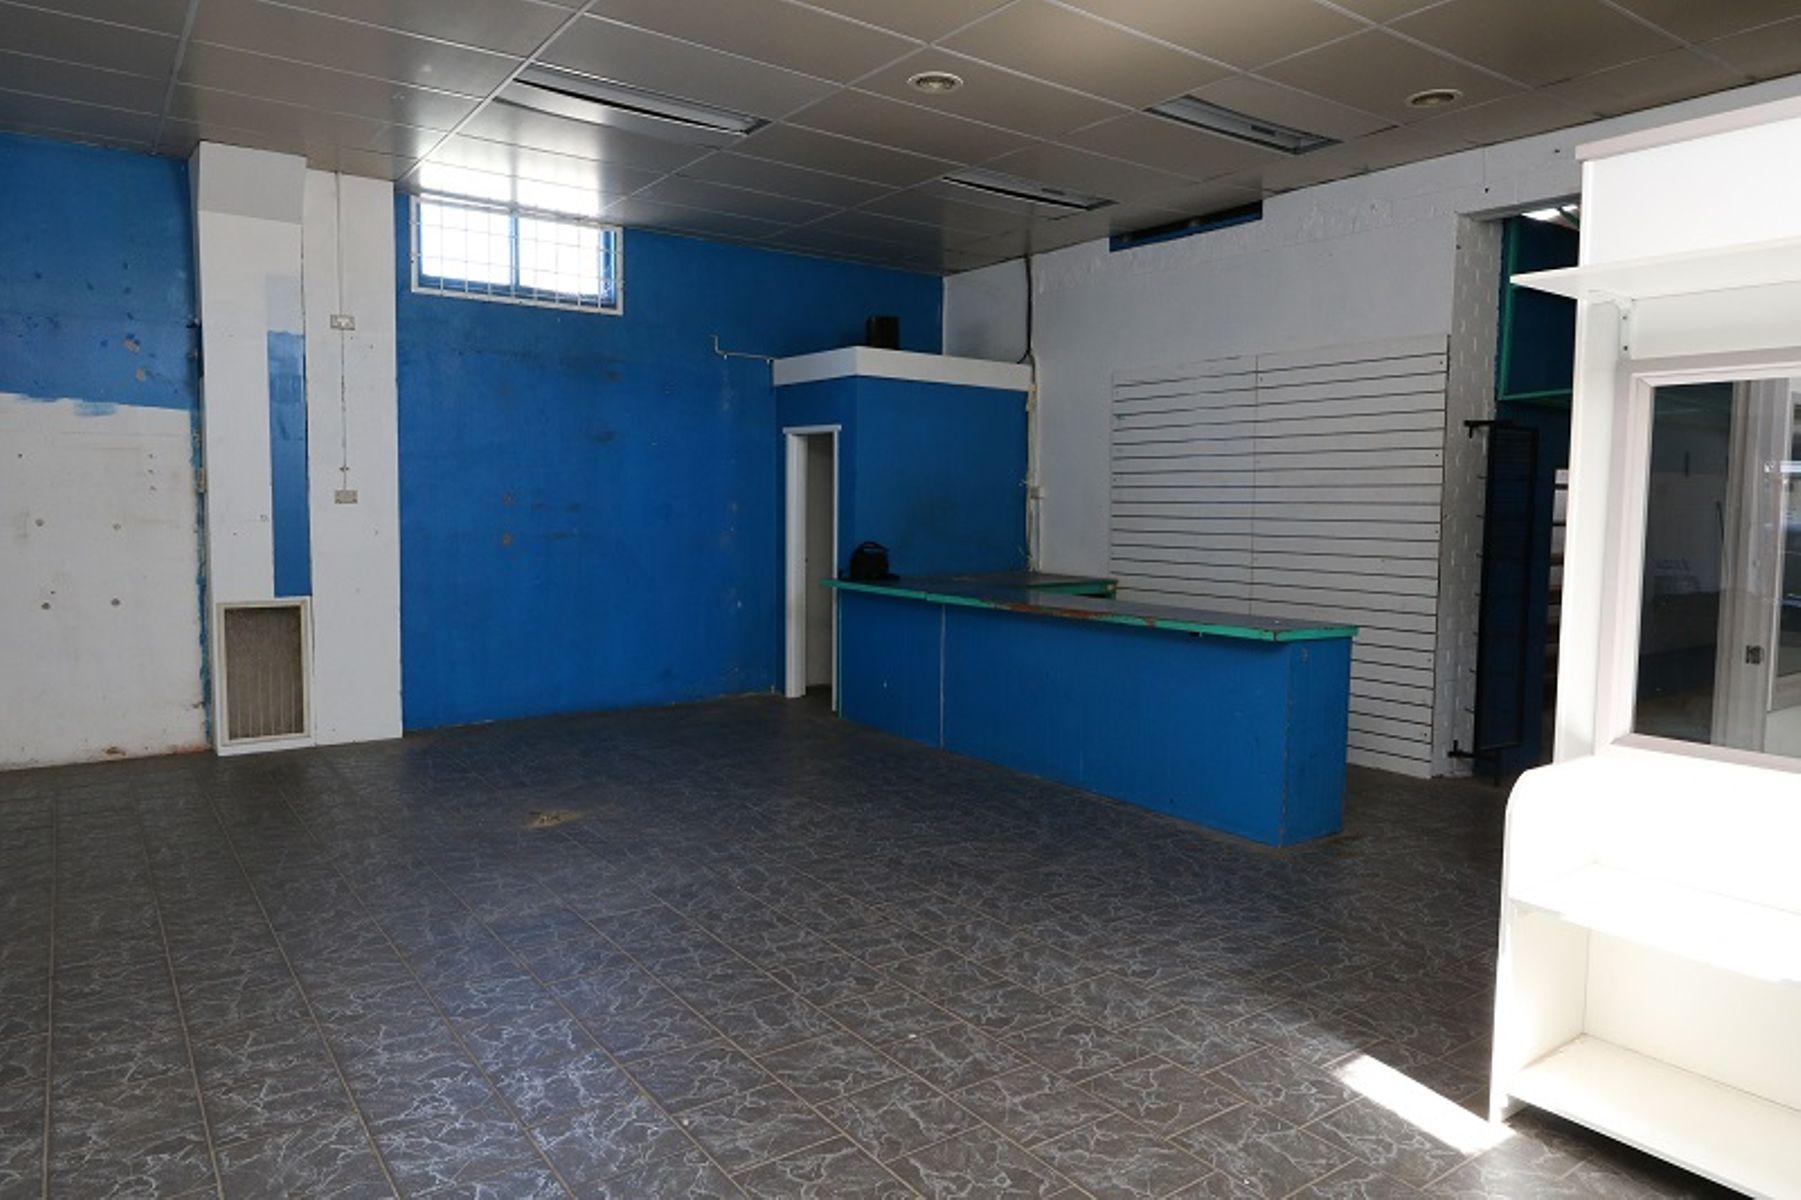 218-220 Allan Street, Kyabram, VIC 3620